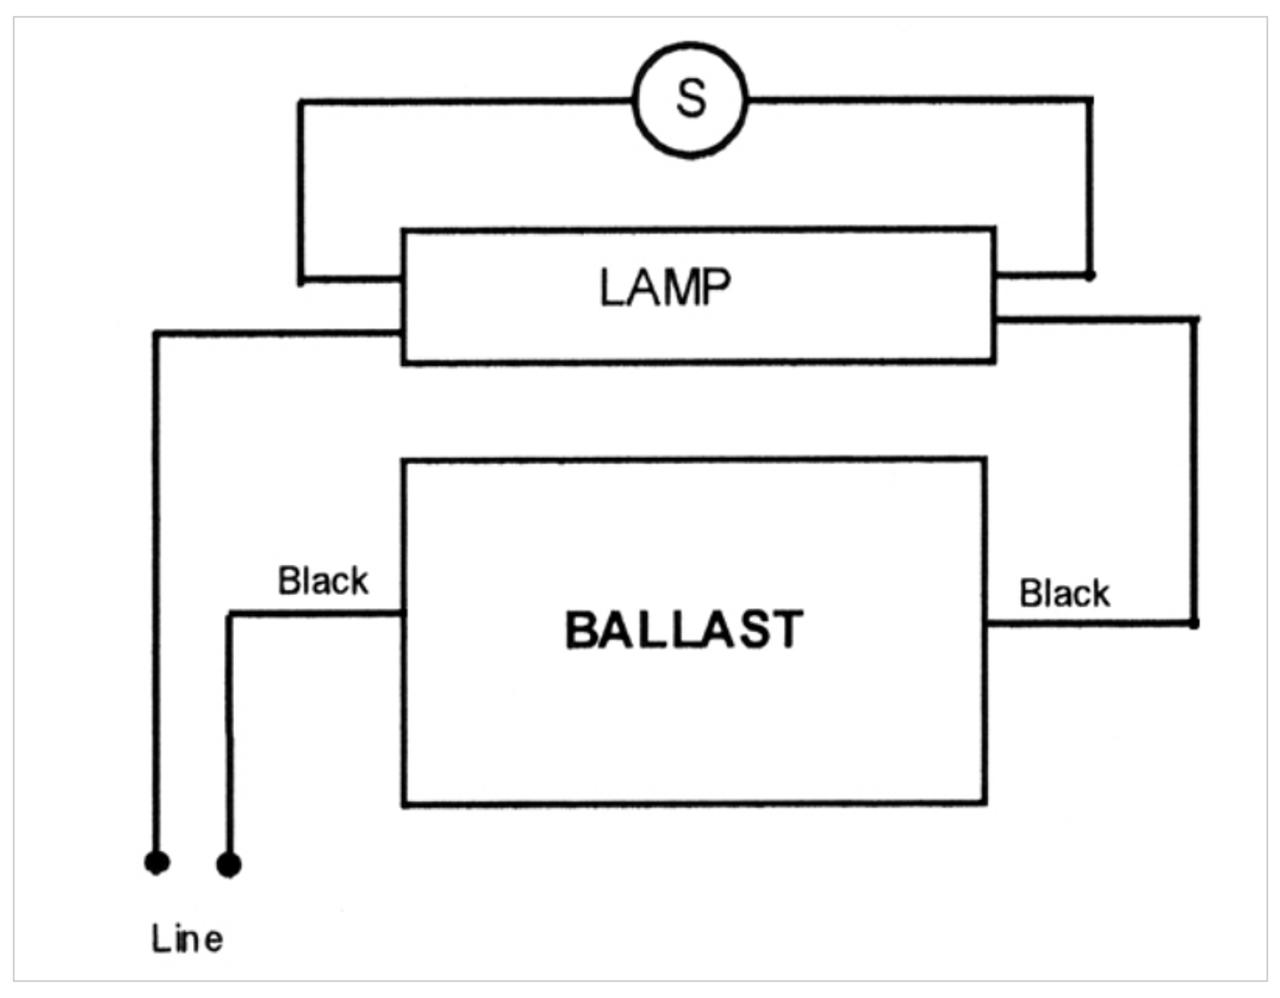 T8 Ballast Wiring Diagram Robertson - Wiring Diagram Information on